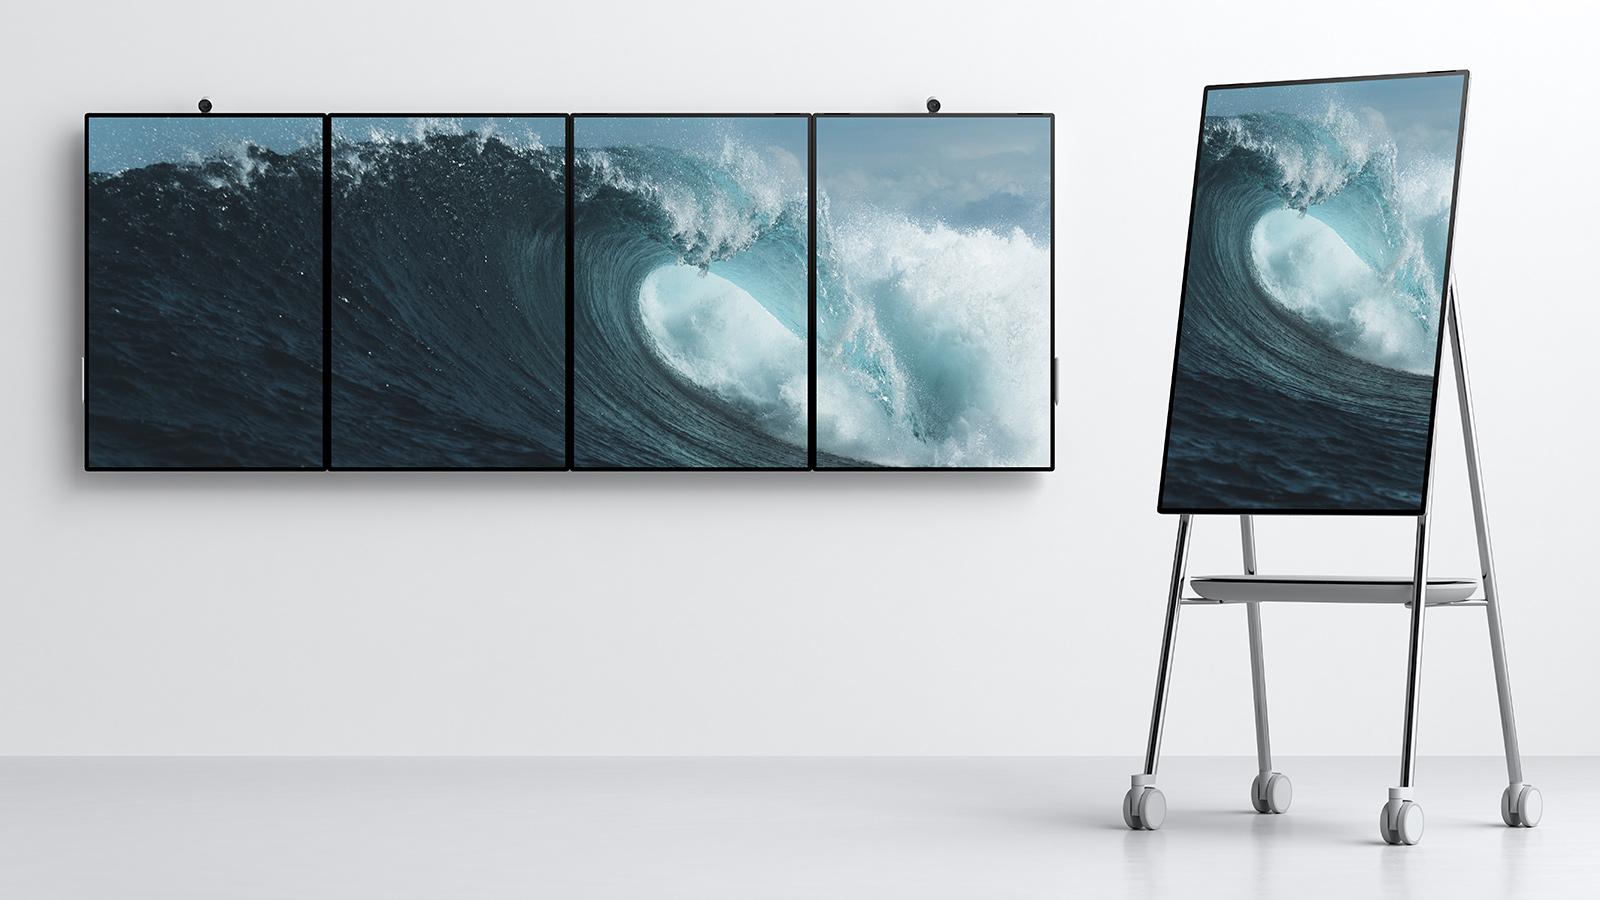 Vier Surface Hub 2-apparaten naast elkaar op de muur in staande stand, en één Surface Hub 2 gedraaid in staande stand op een standaard die is ontworpen door Steelcase